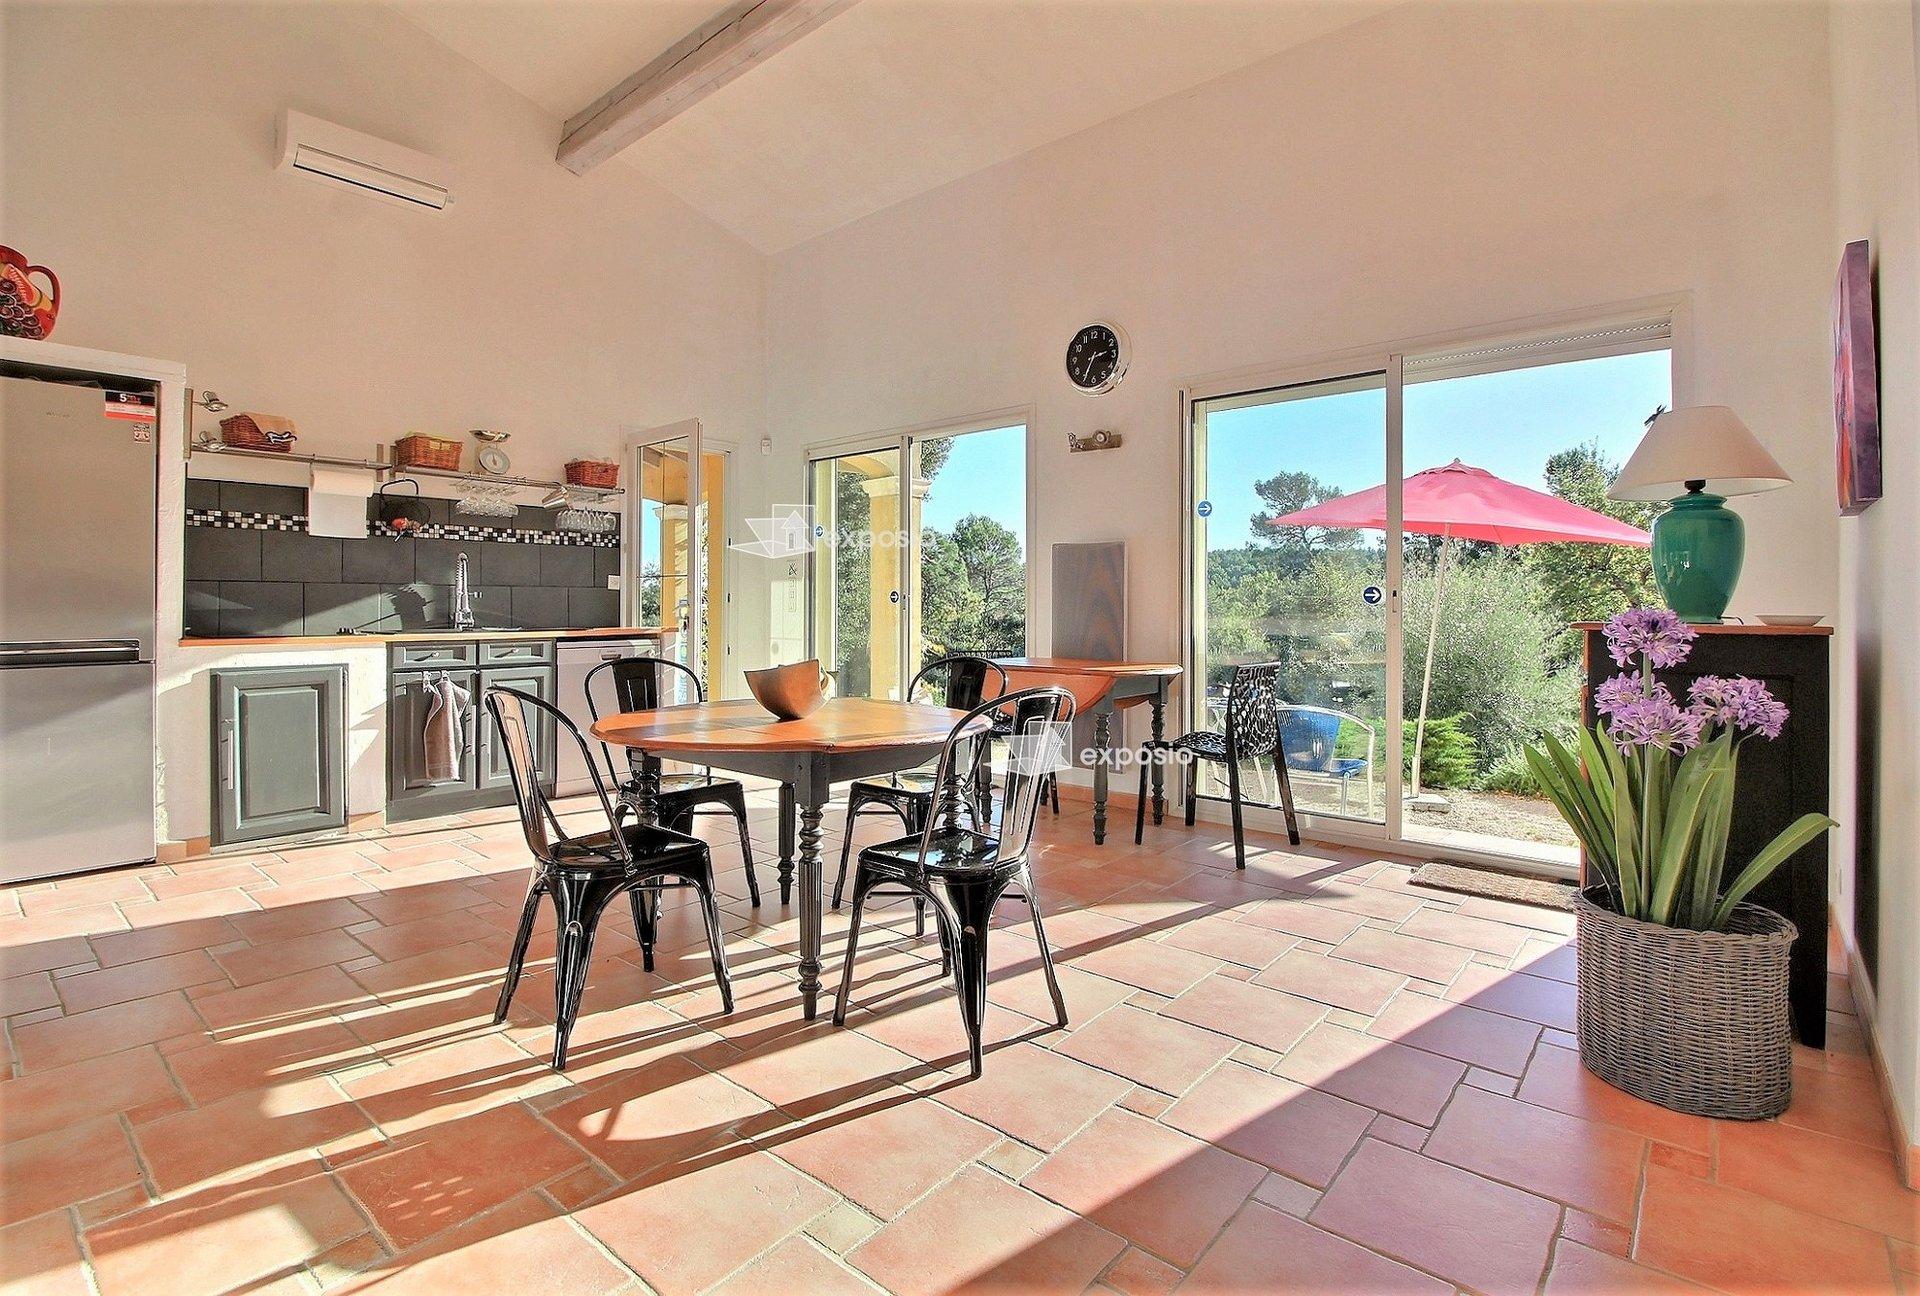 Lorgues, architect's villa 160 m2 on a land of 4300 m2.